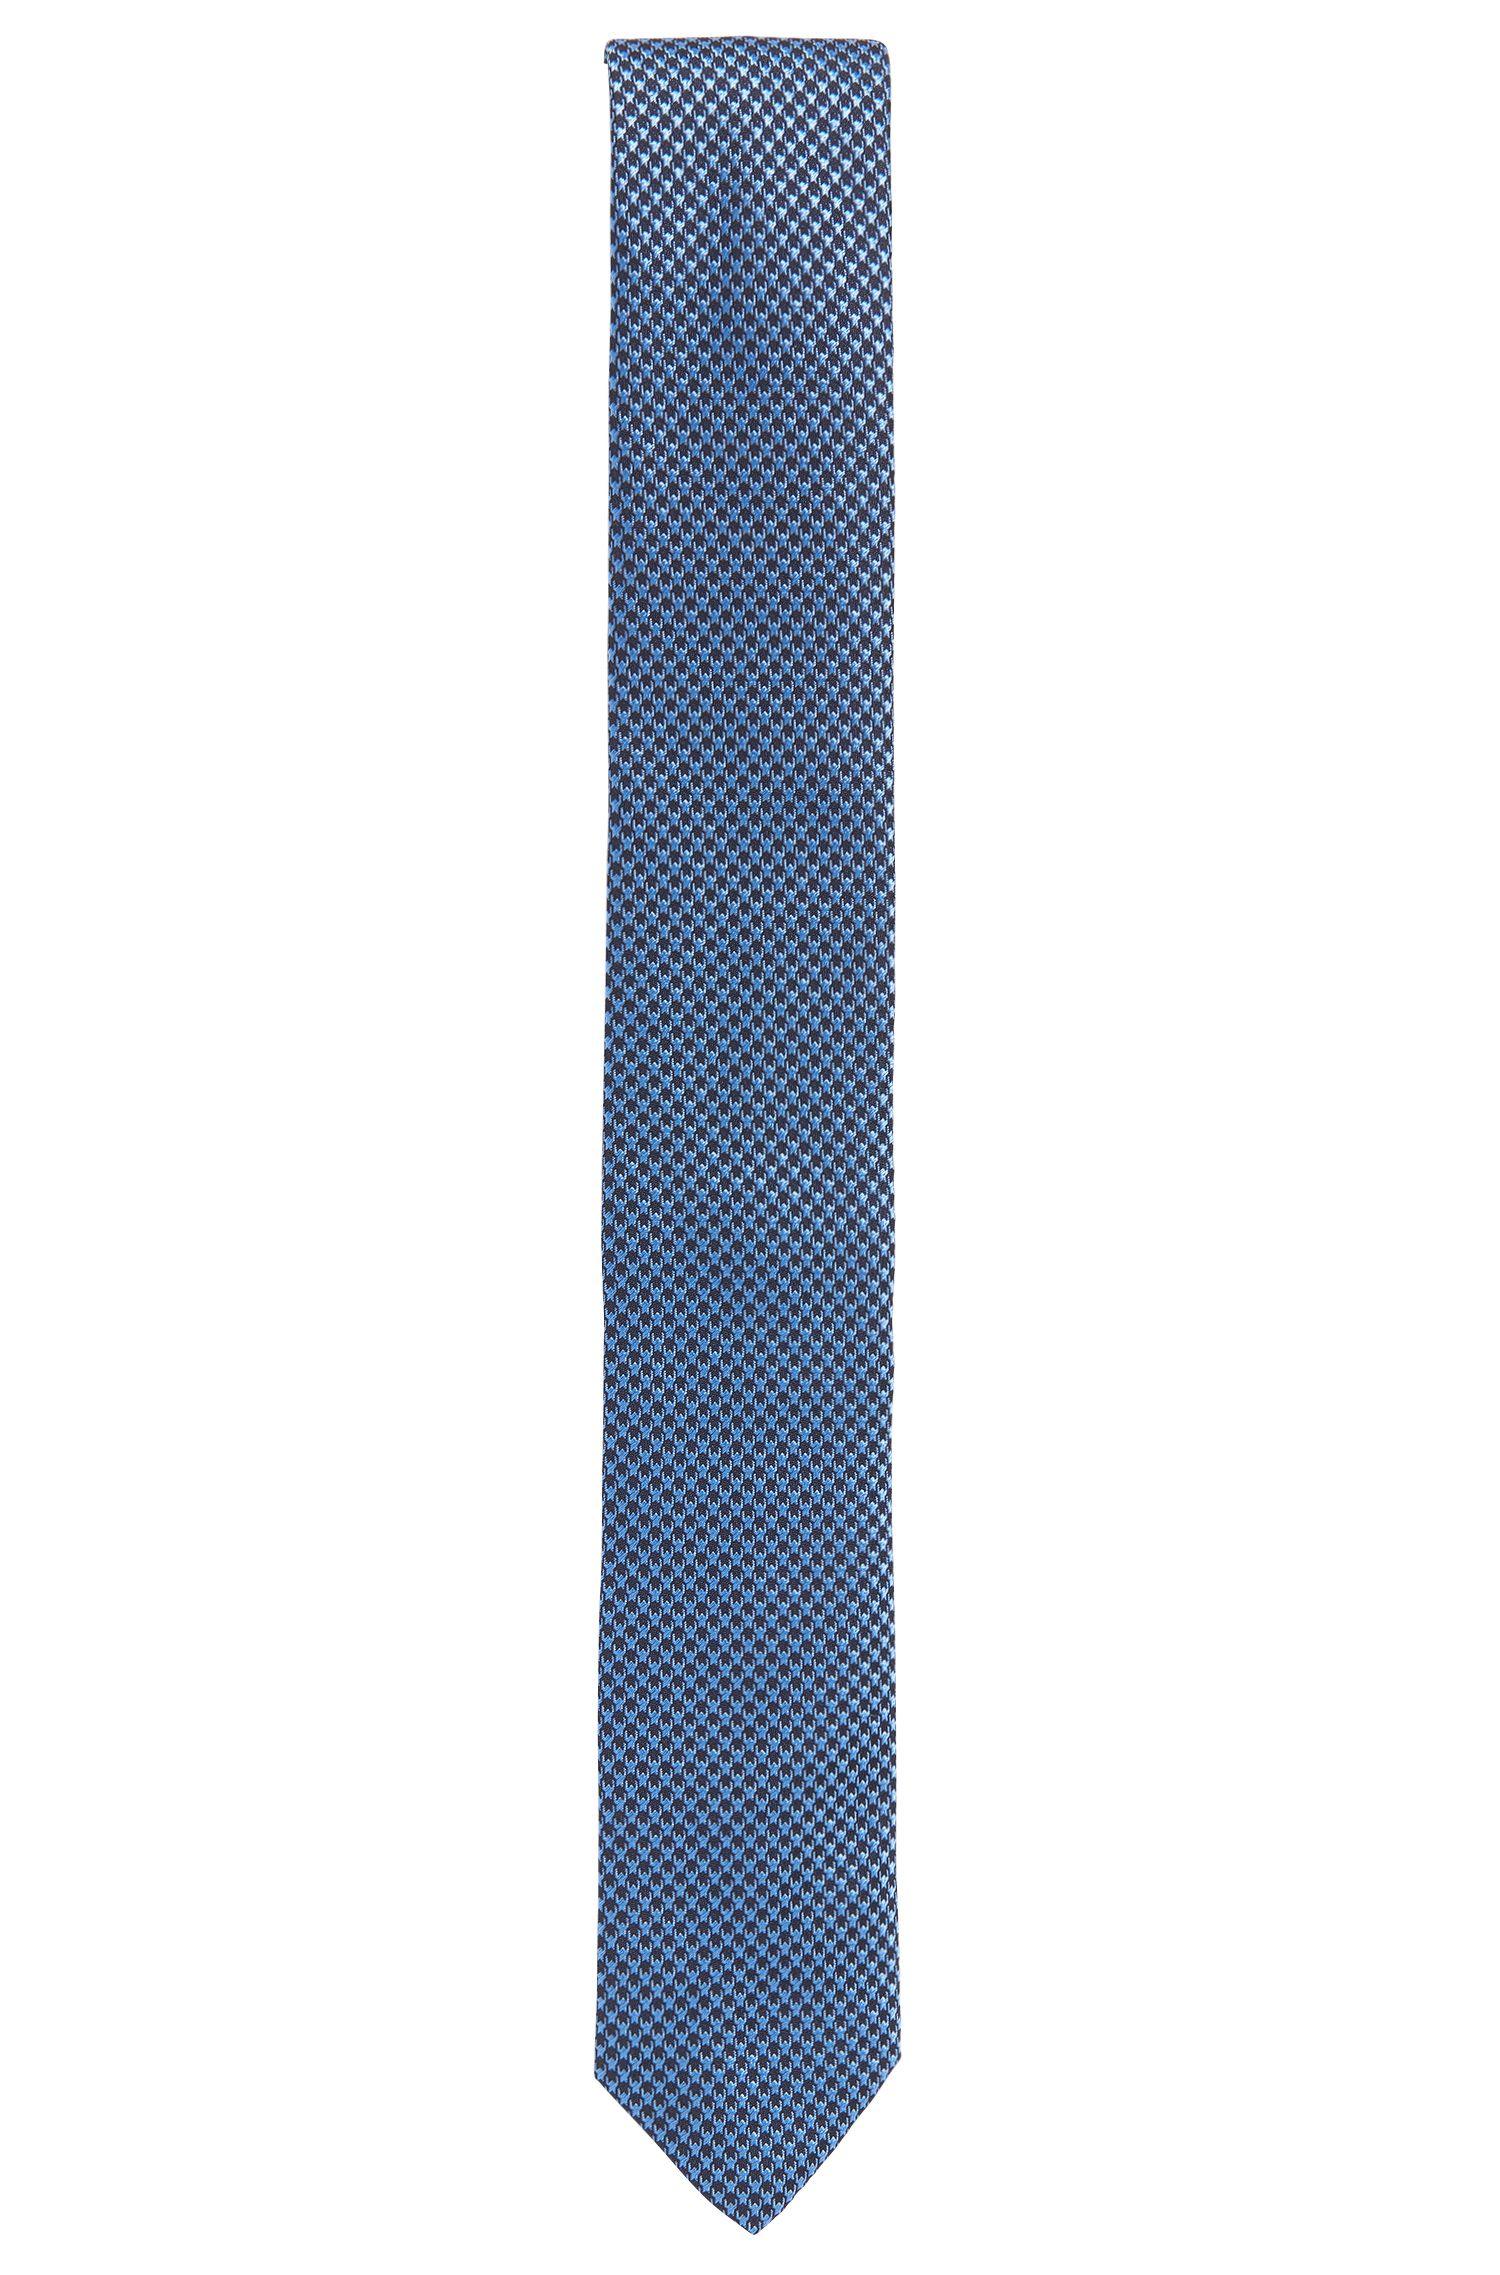 'Tie 6 cm' | Slim, Dobby Silk Tie